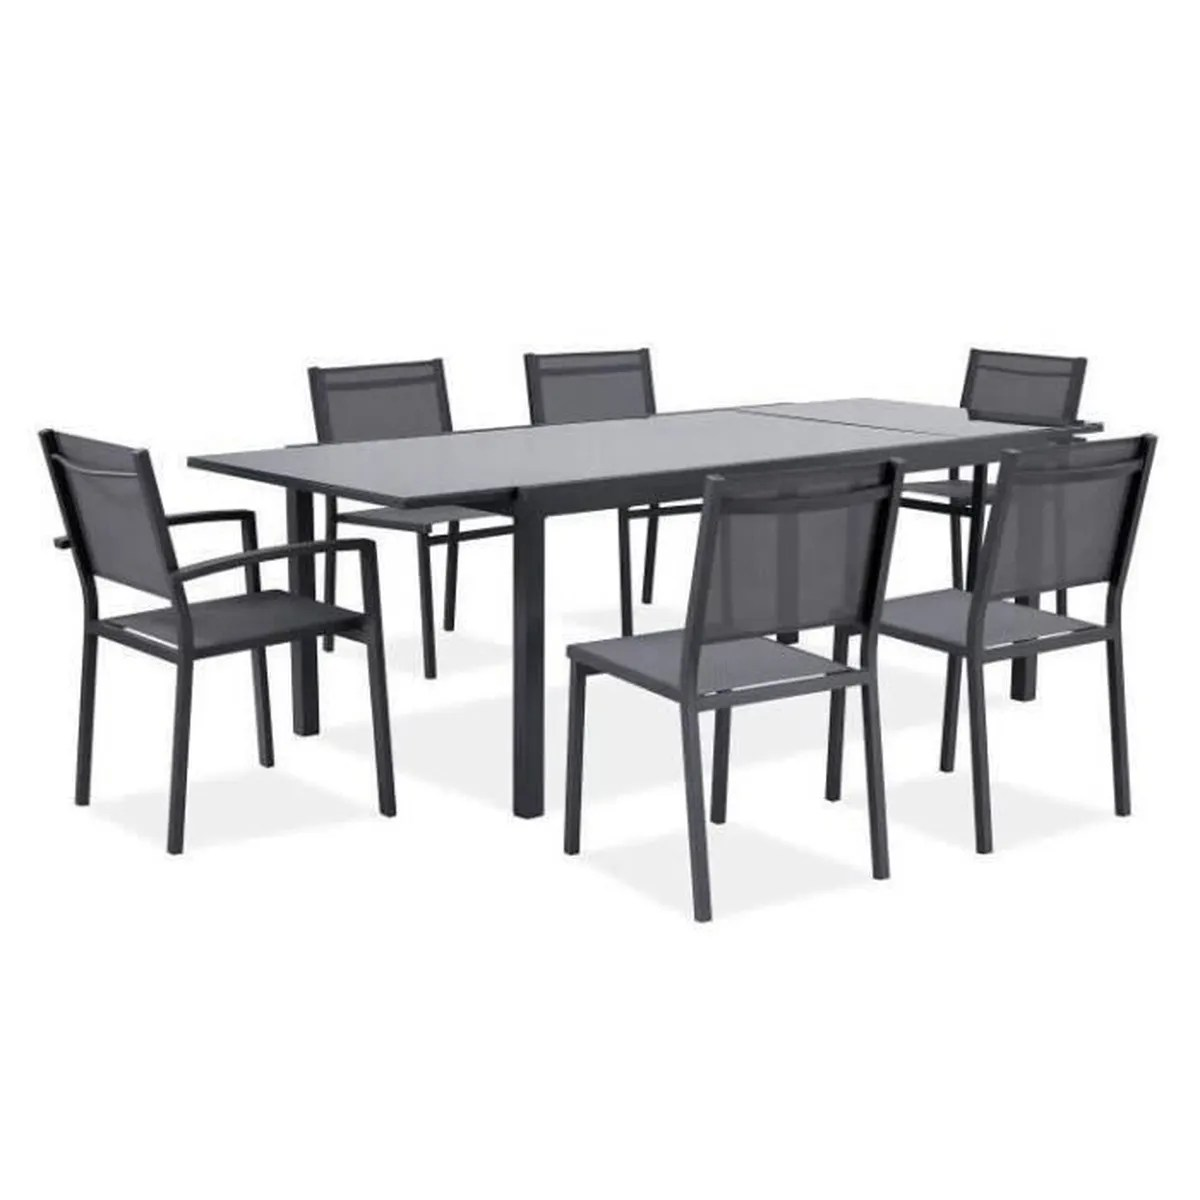 Table Salon De Jardin Extensible | Salon De Jardin Extensible Belle ...